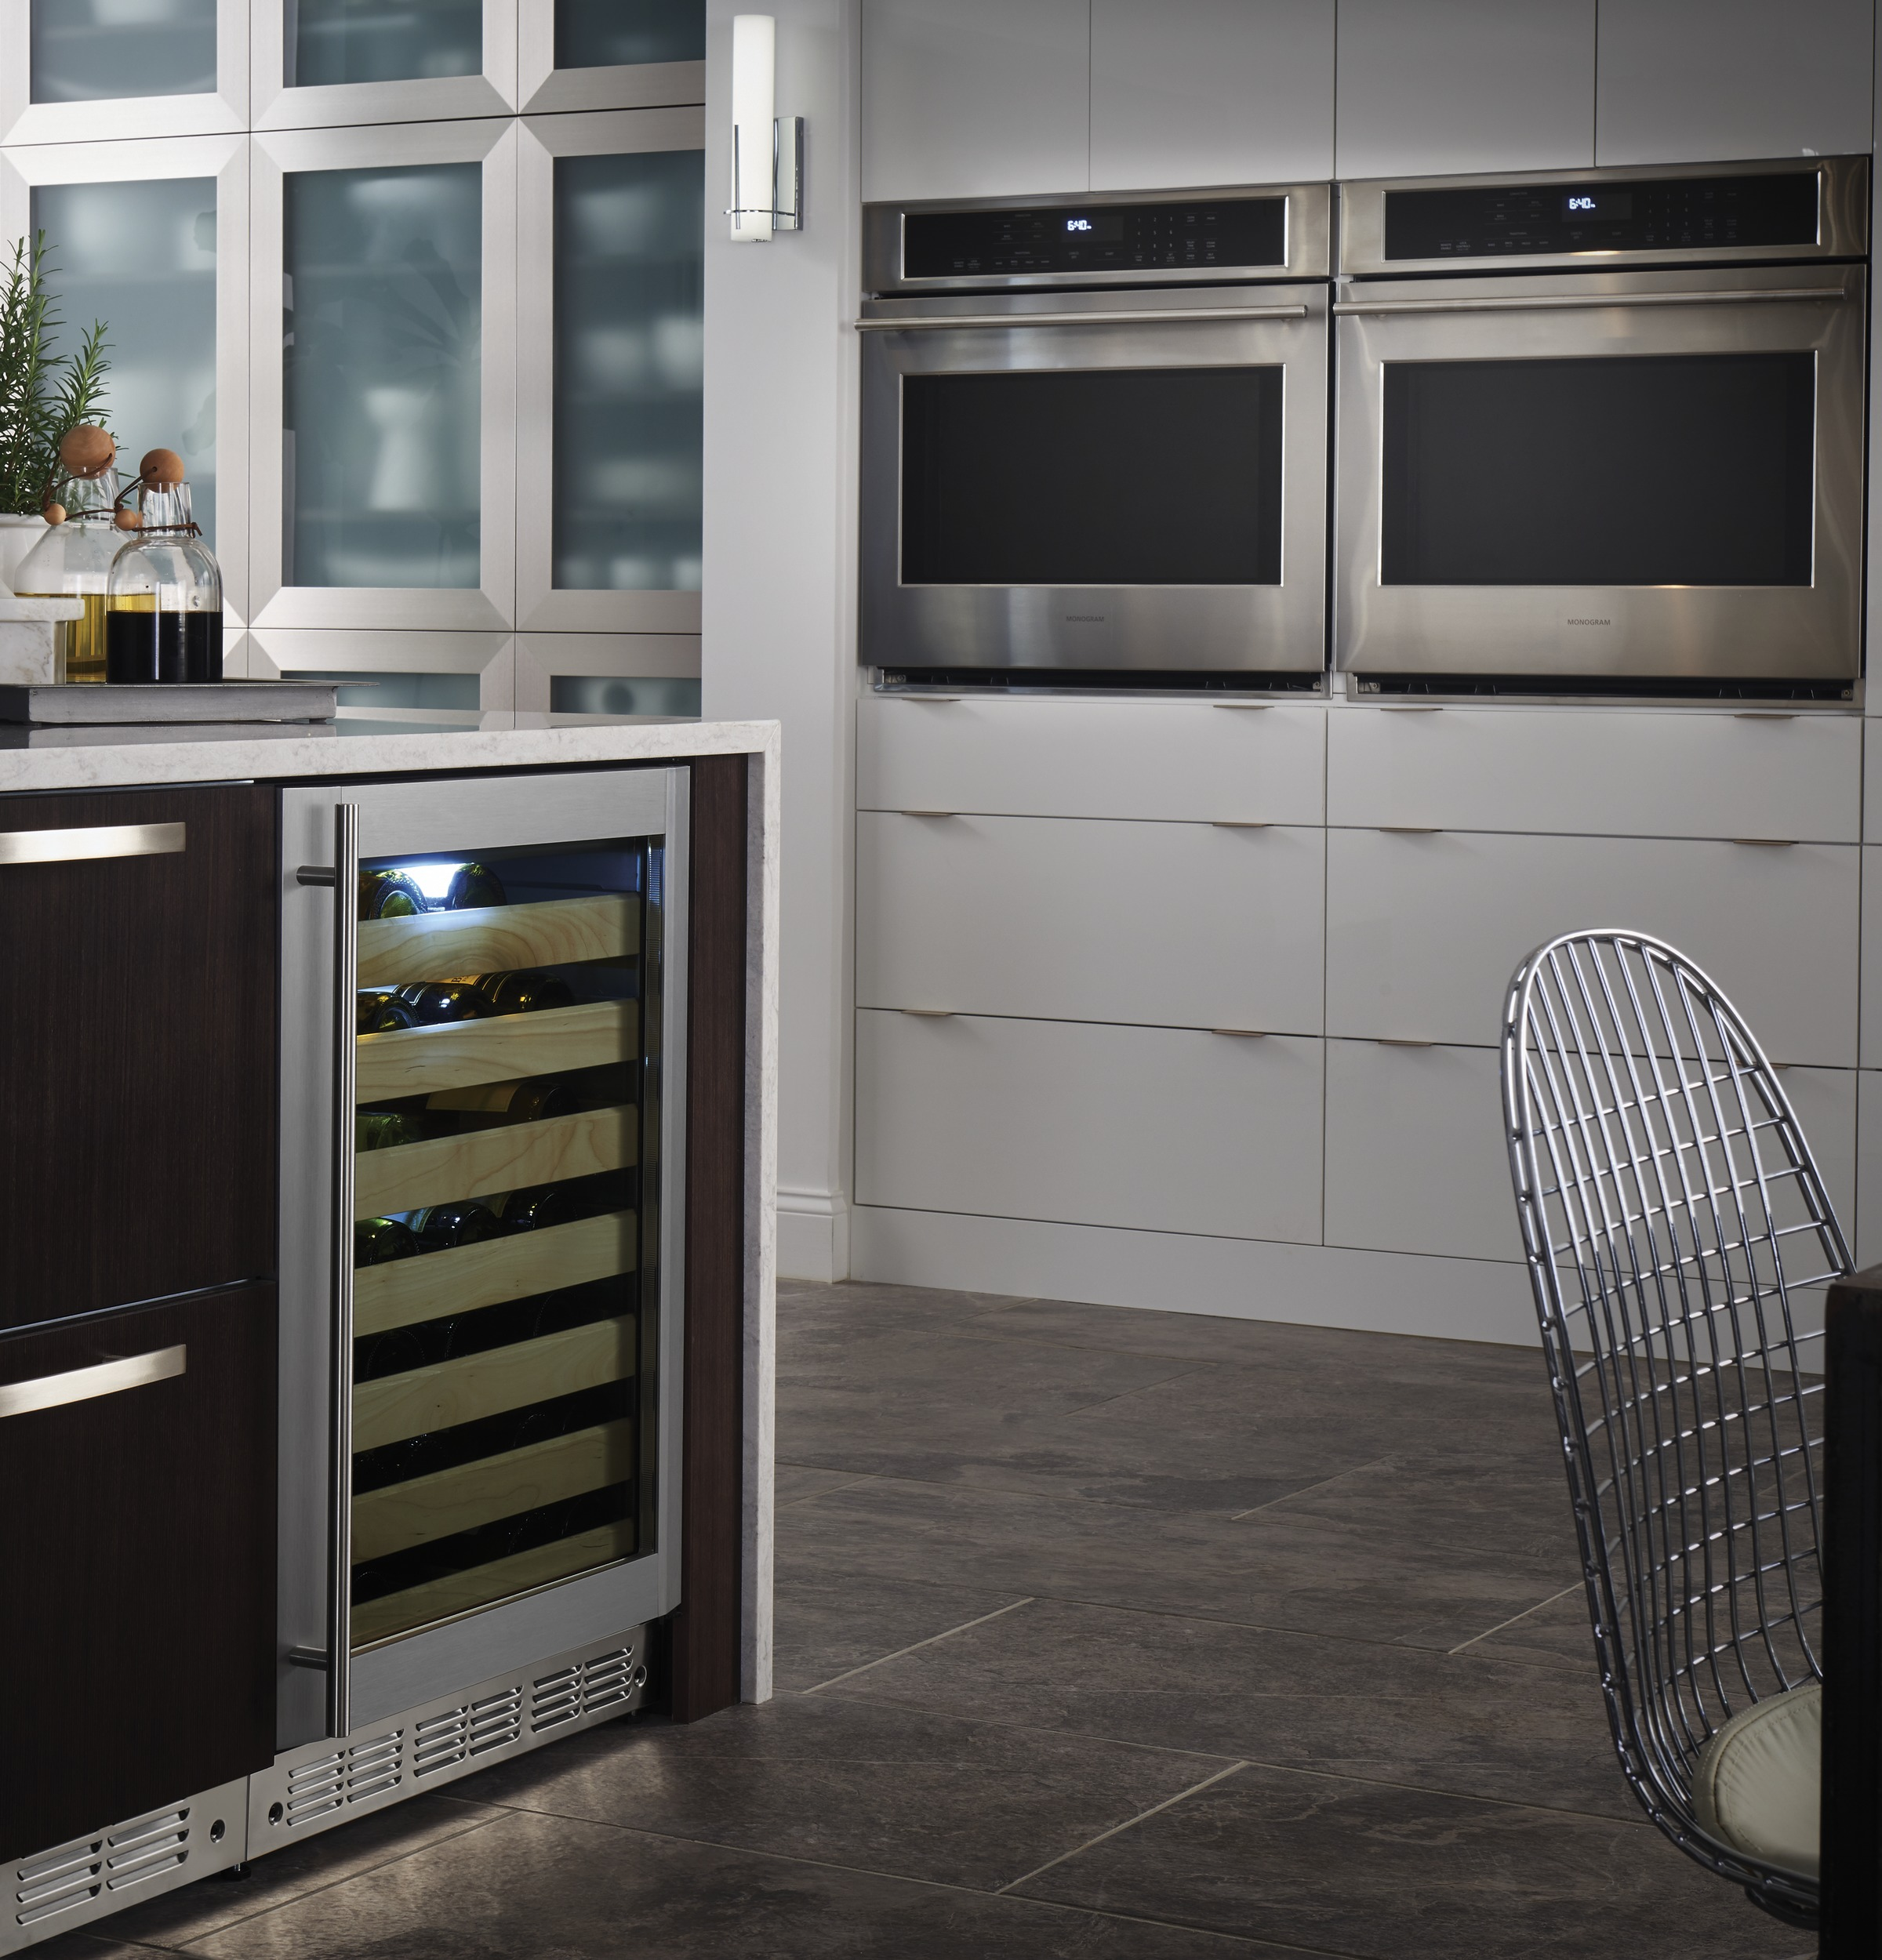 "Model: ZET9050SHSS | Monogram Monogram 30"" Electric Convection Single Wall Oven"